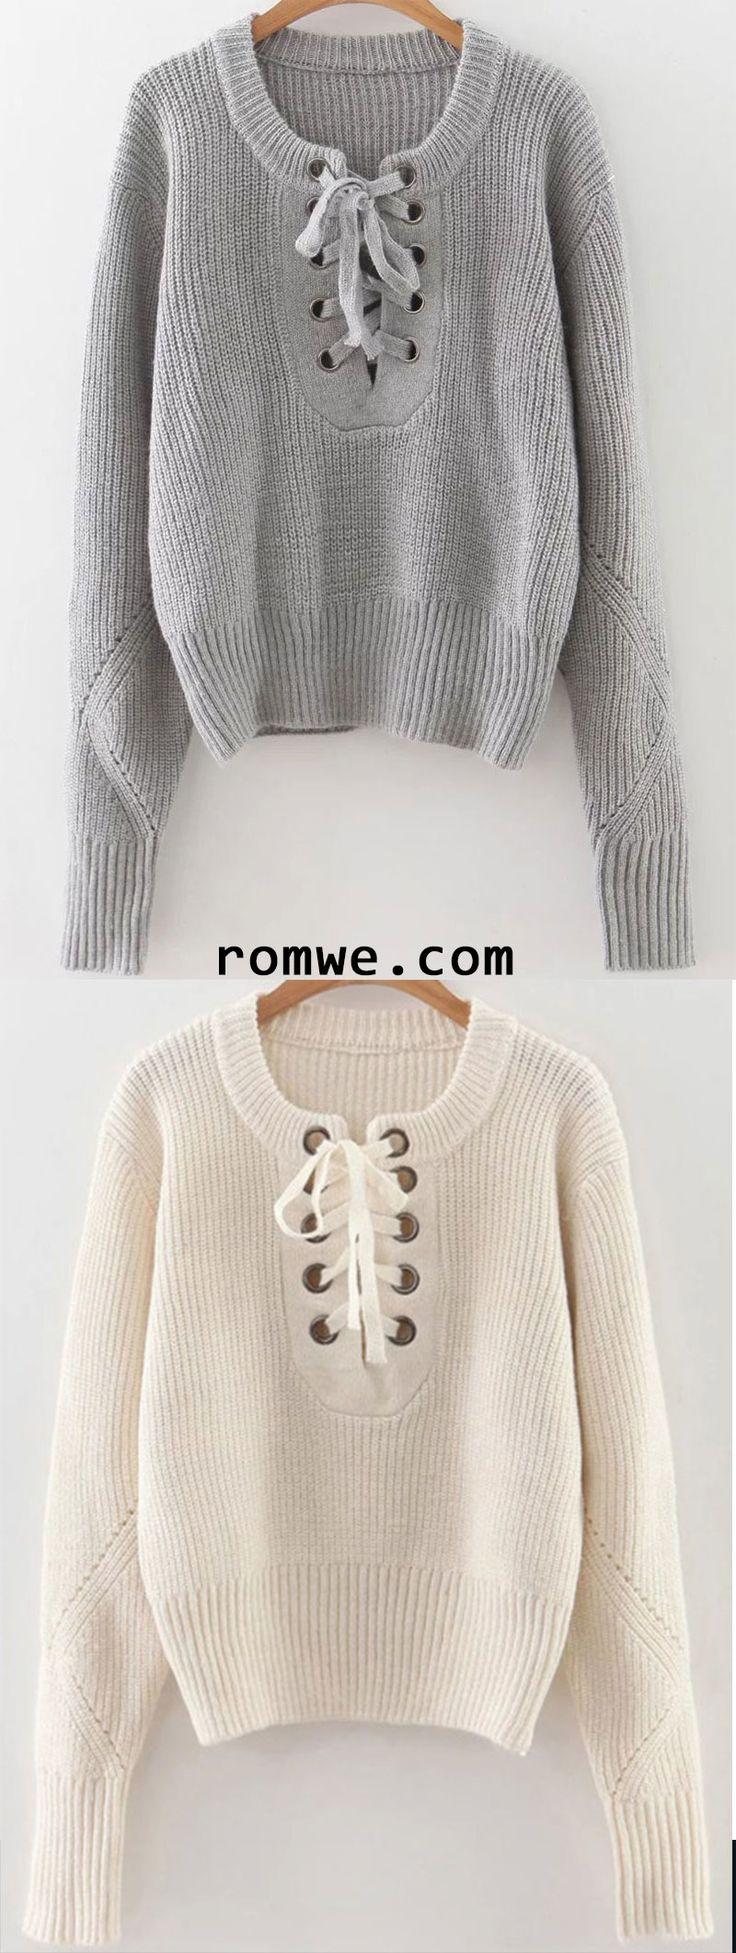 Eyelet Lace Up Ribbed Trim Sweater